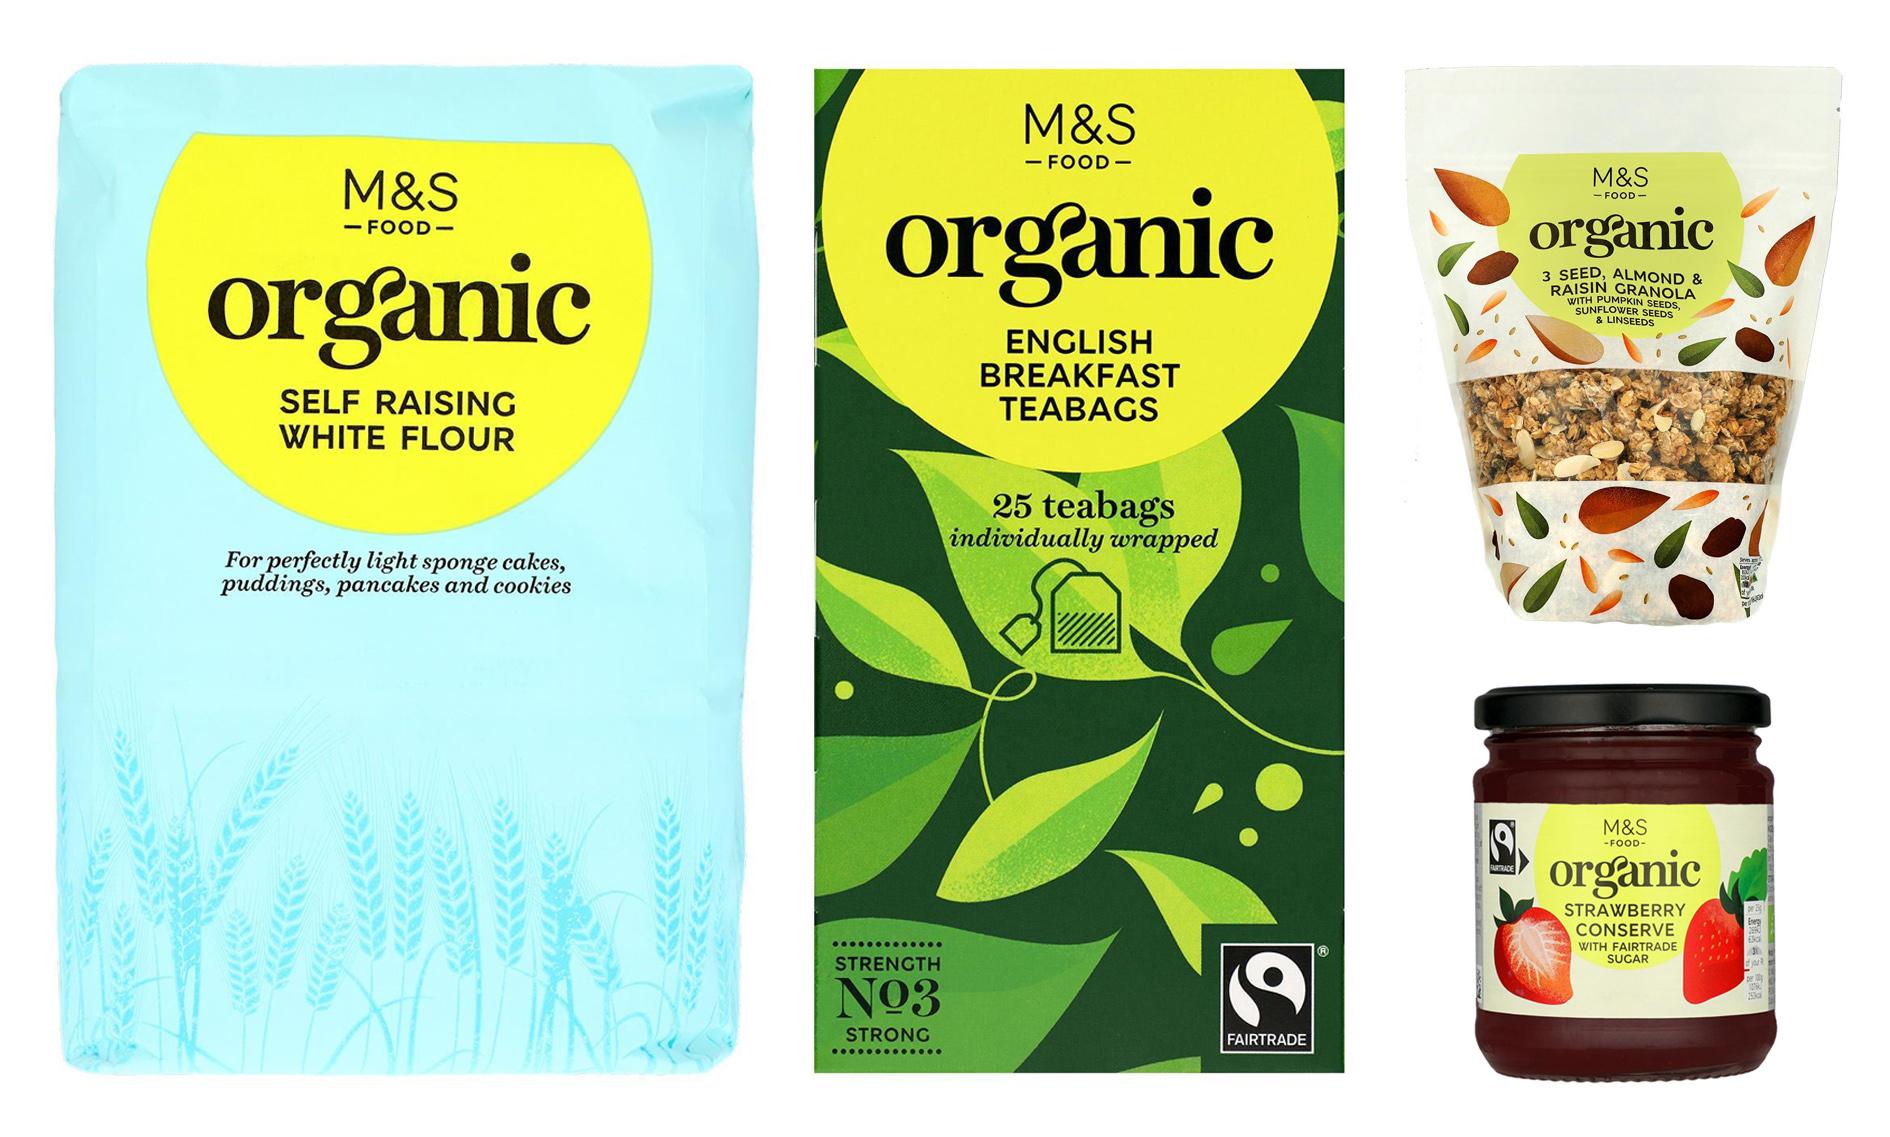 Marks & Spencer's Organic food